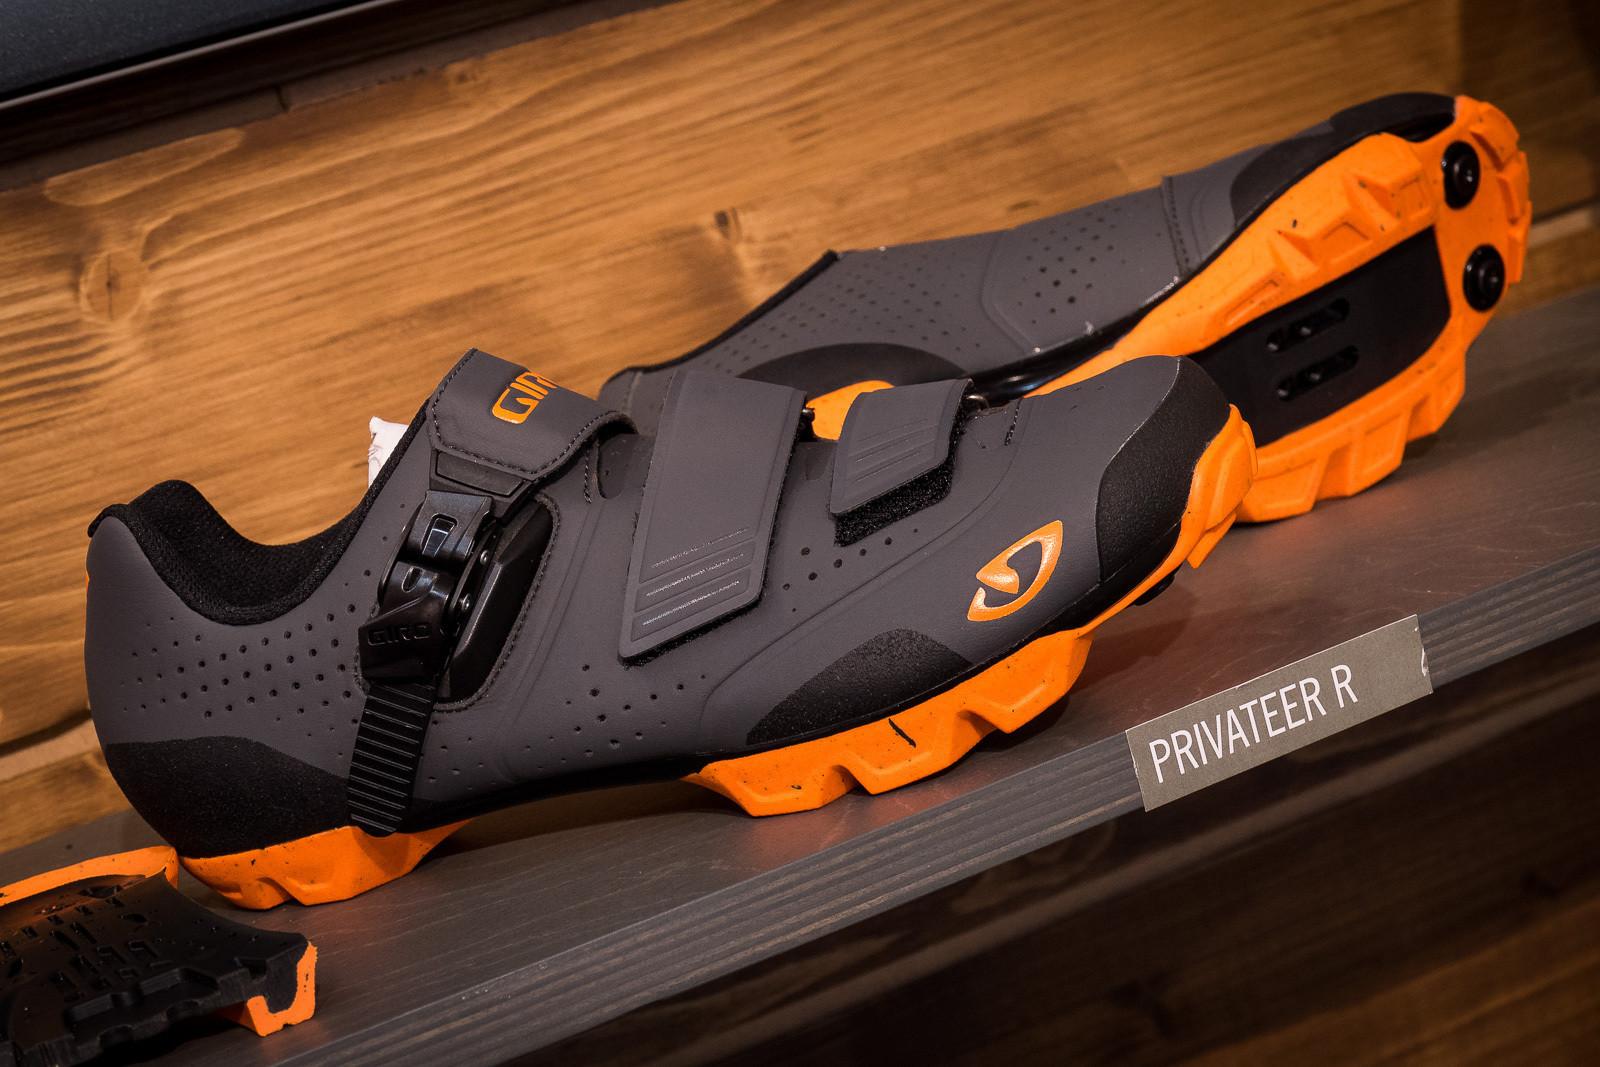 Giro Privateer R and Terraduro Shoes - 2016 Mountain Bike Apparel & Protection at Eurobike - Mountain Biking Pictures - Vital MTB